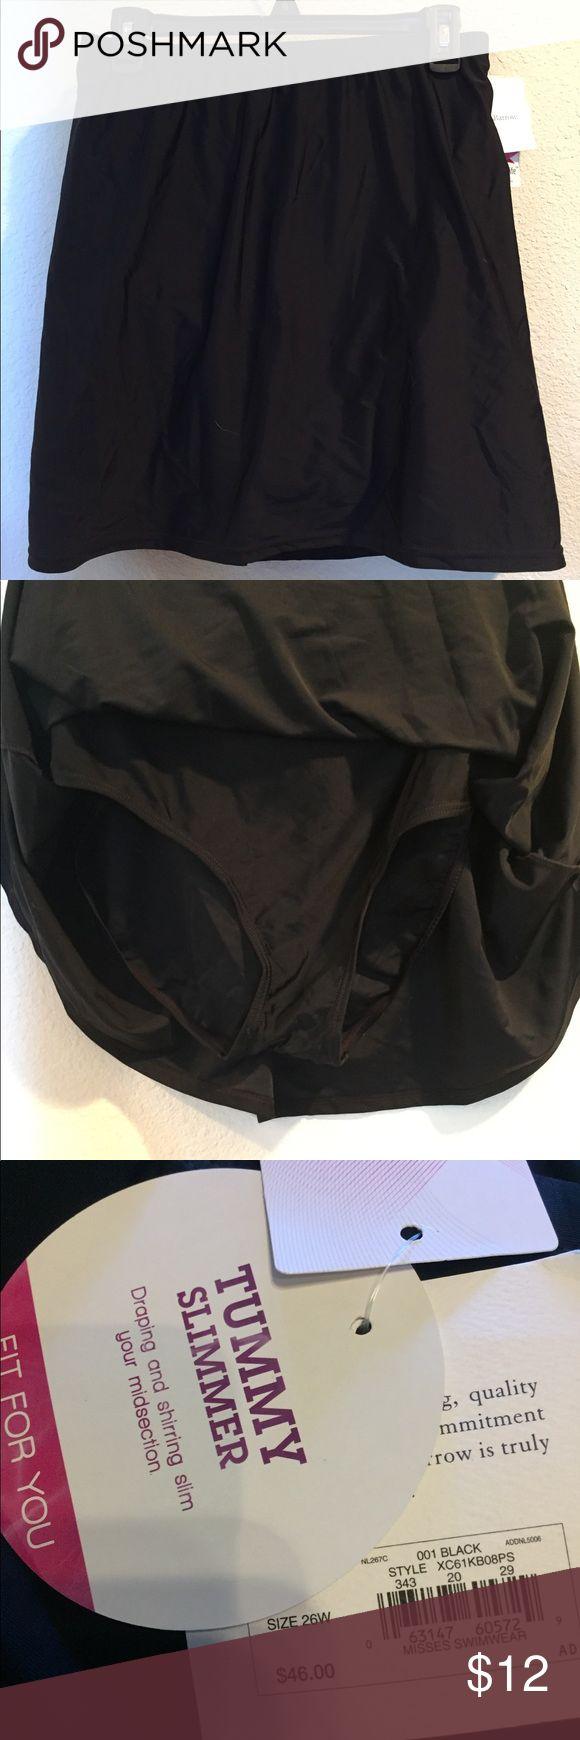 NWT. Swim Skirt NWT. Black swim skirt. croft & barrow Swim